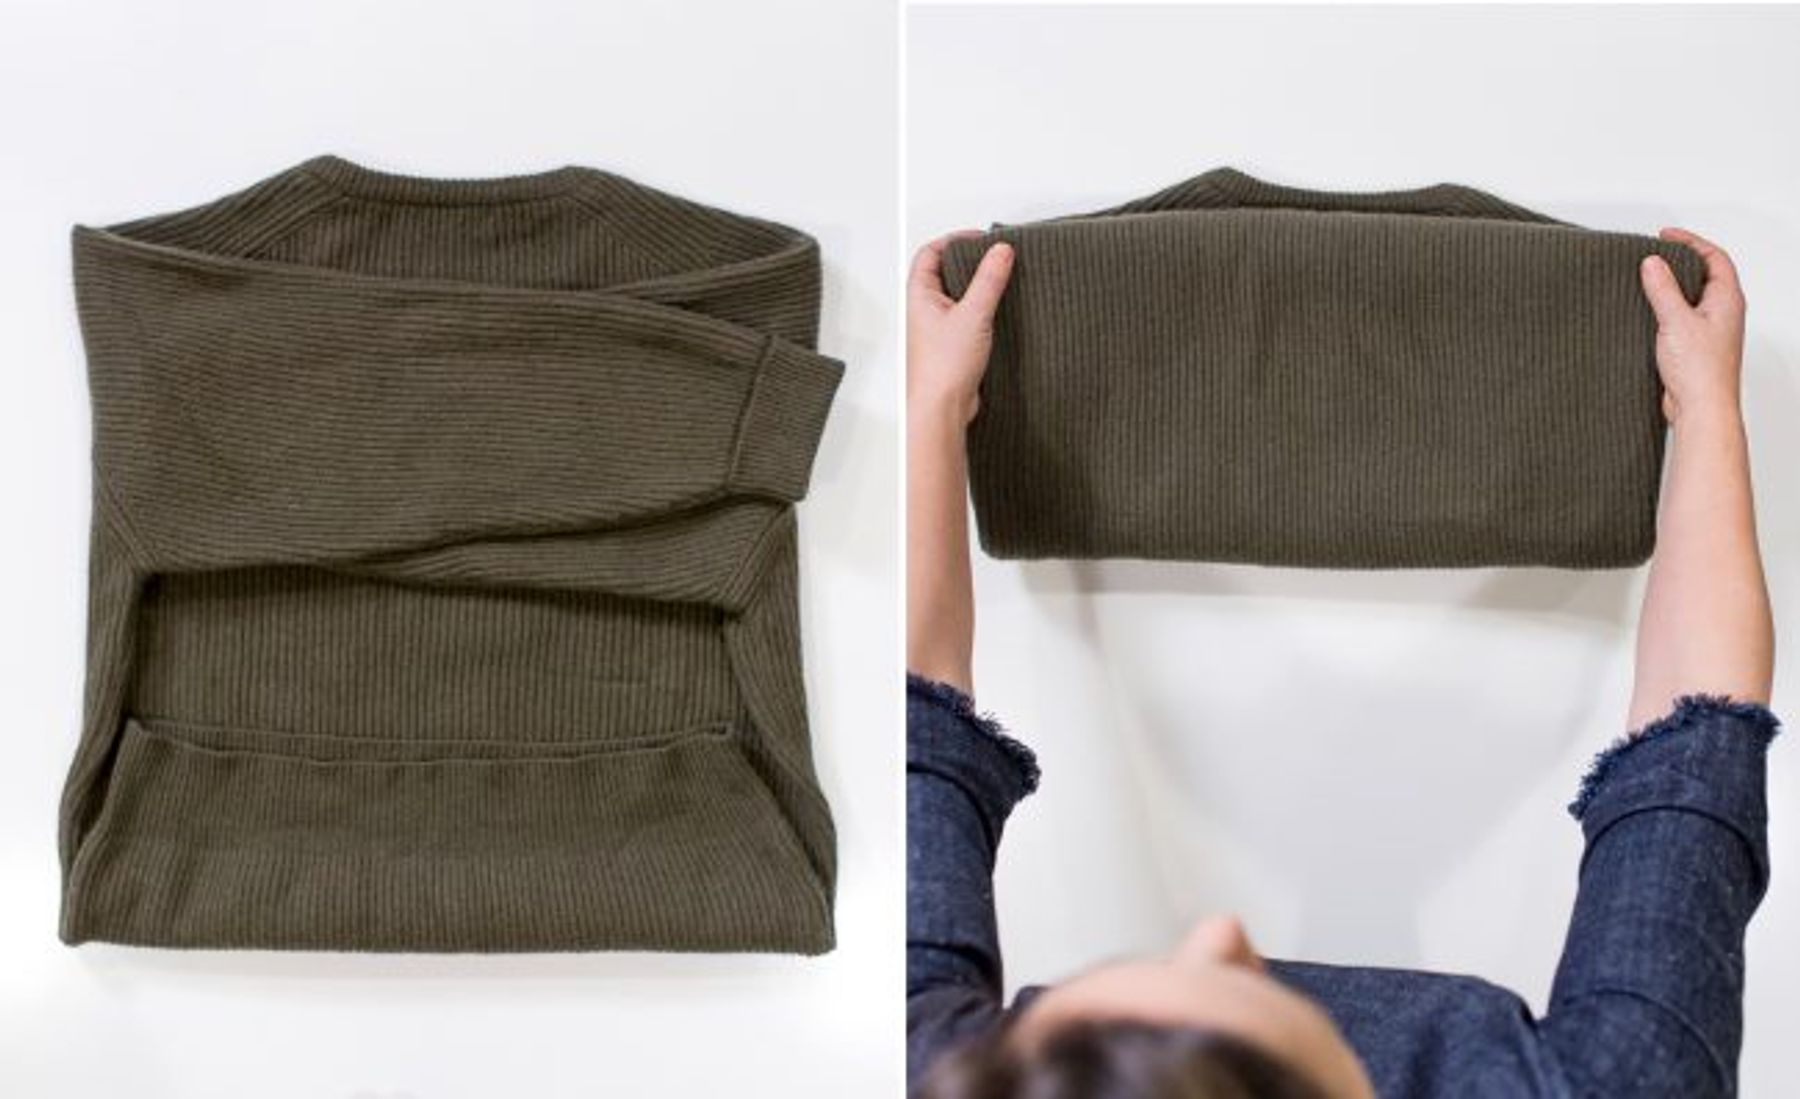 Cách xếp quần áo len